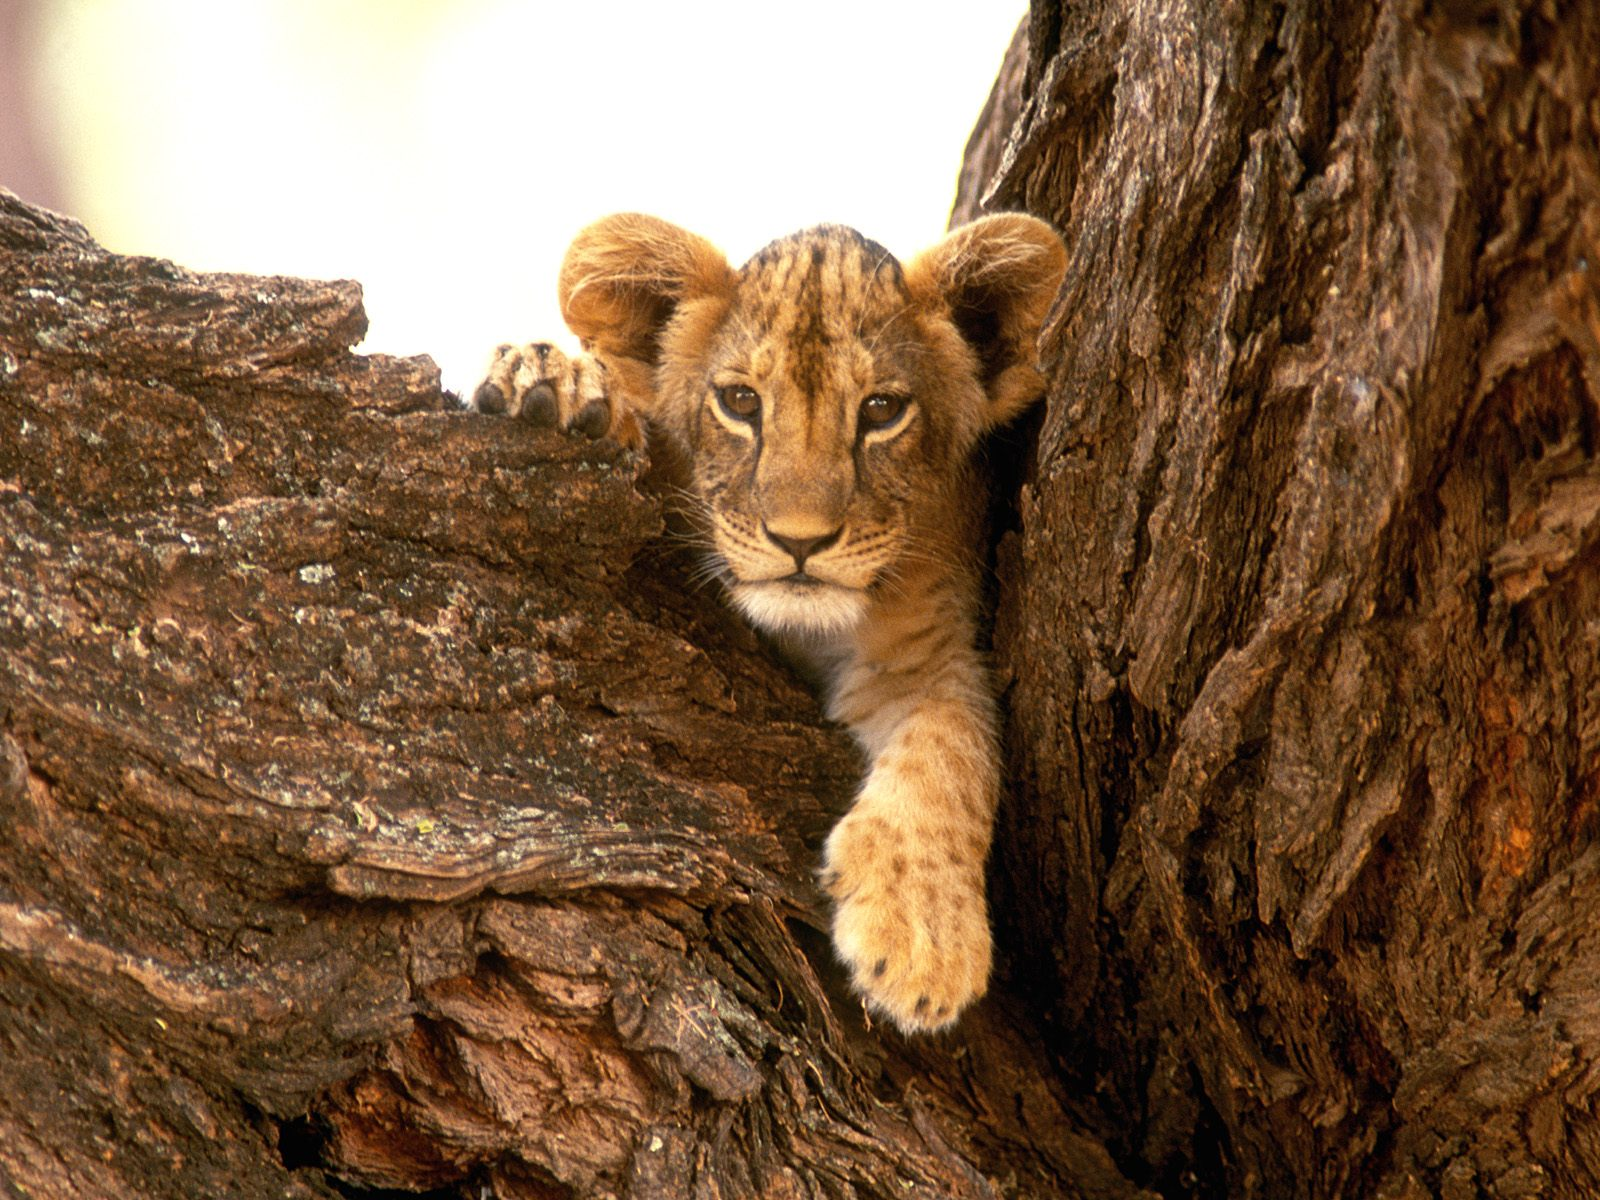 Lion wallpapers |Funny Animal